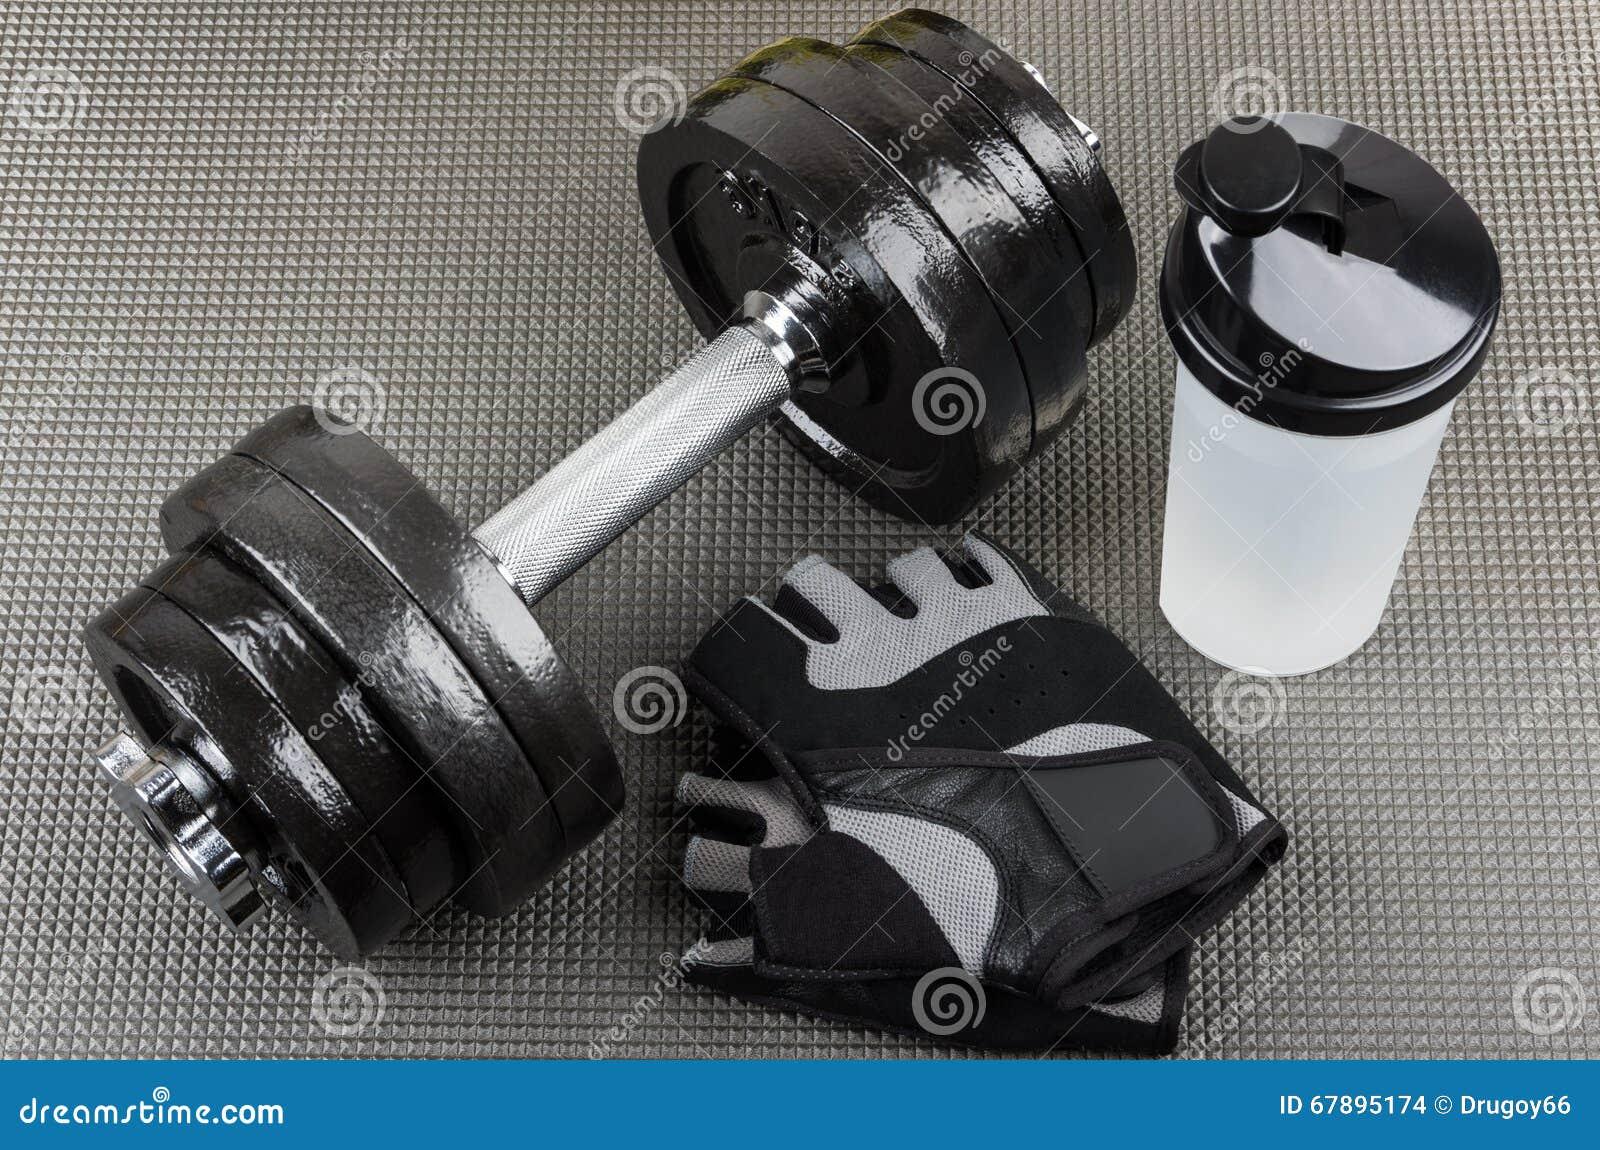 Ajustable哑铃、训练手套和振动器在席子